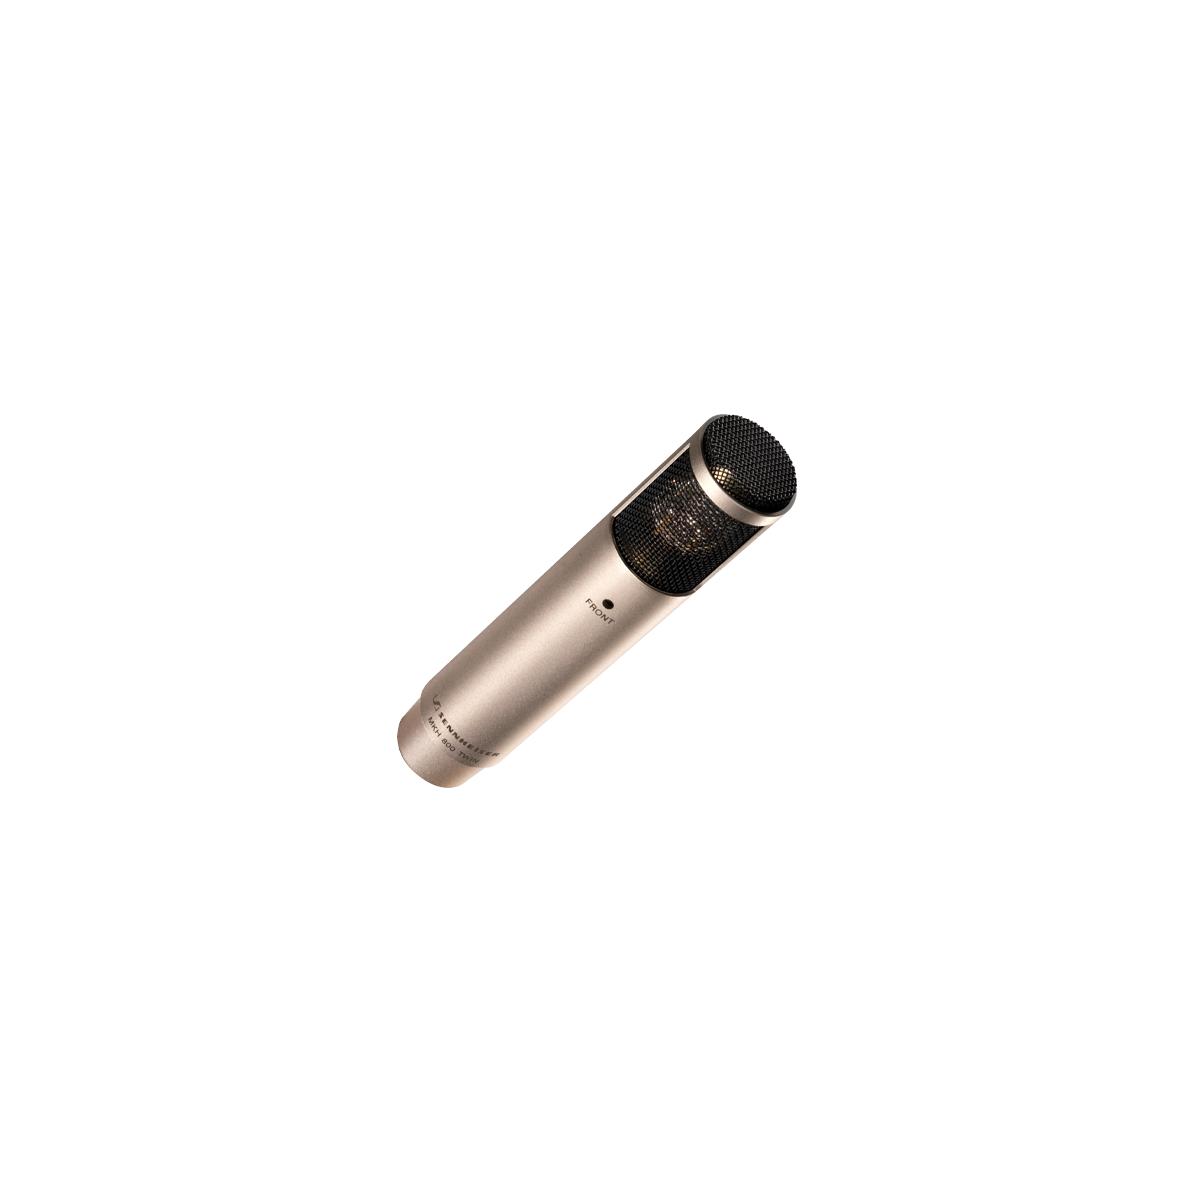 Micros studio - Sennheiser - MKH 800 TWIN Ni